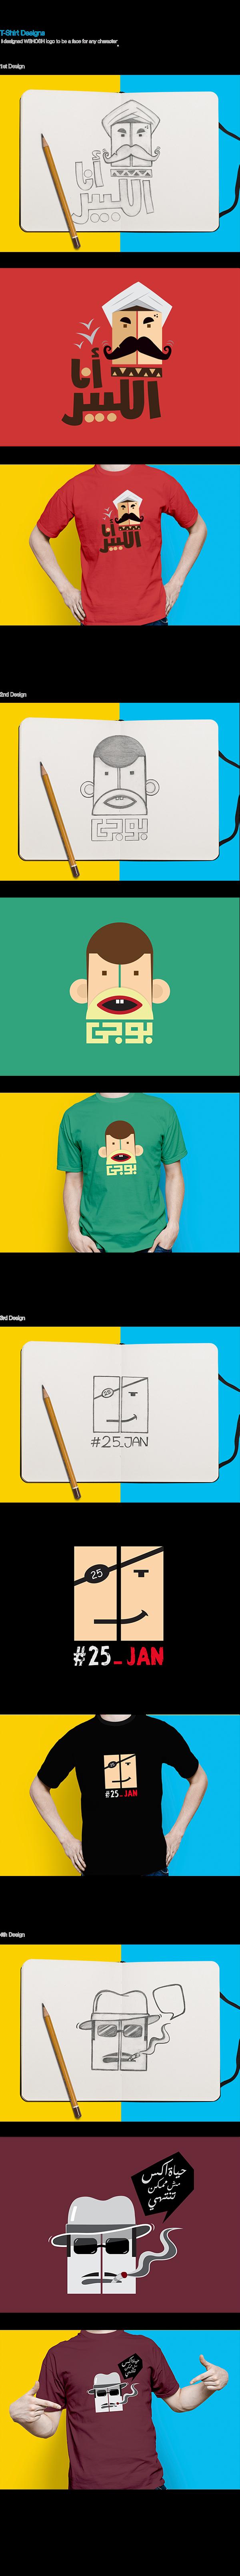 logo identity color design typo vector t-shirt Stationery letterhead